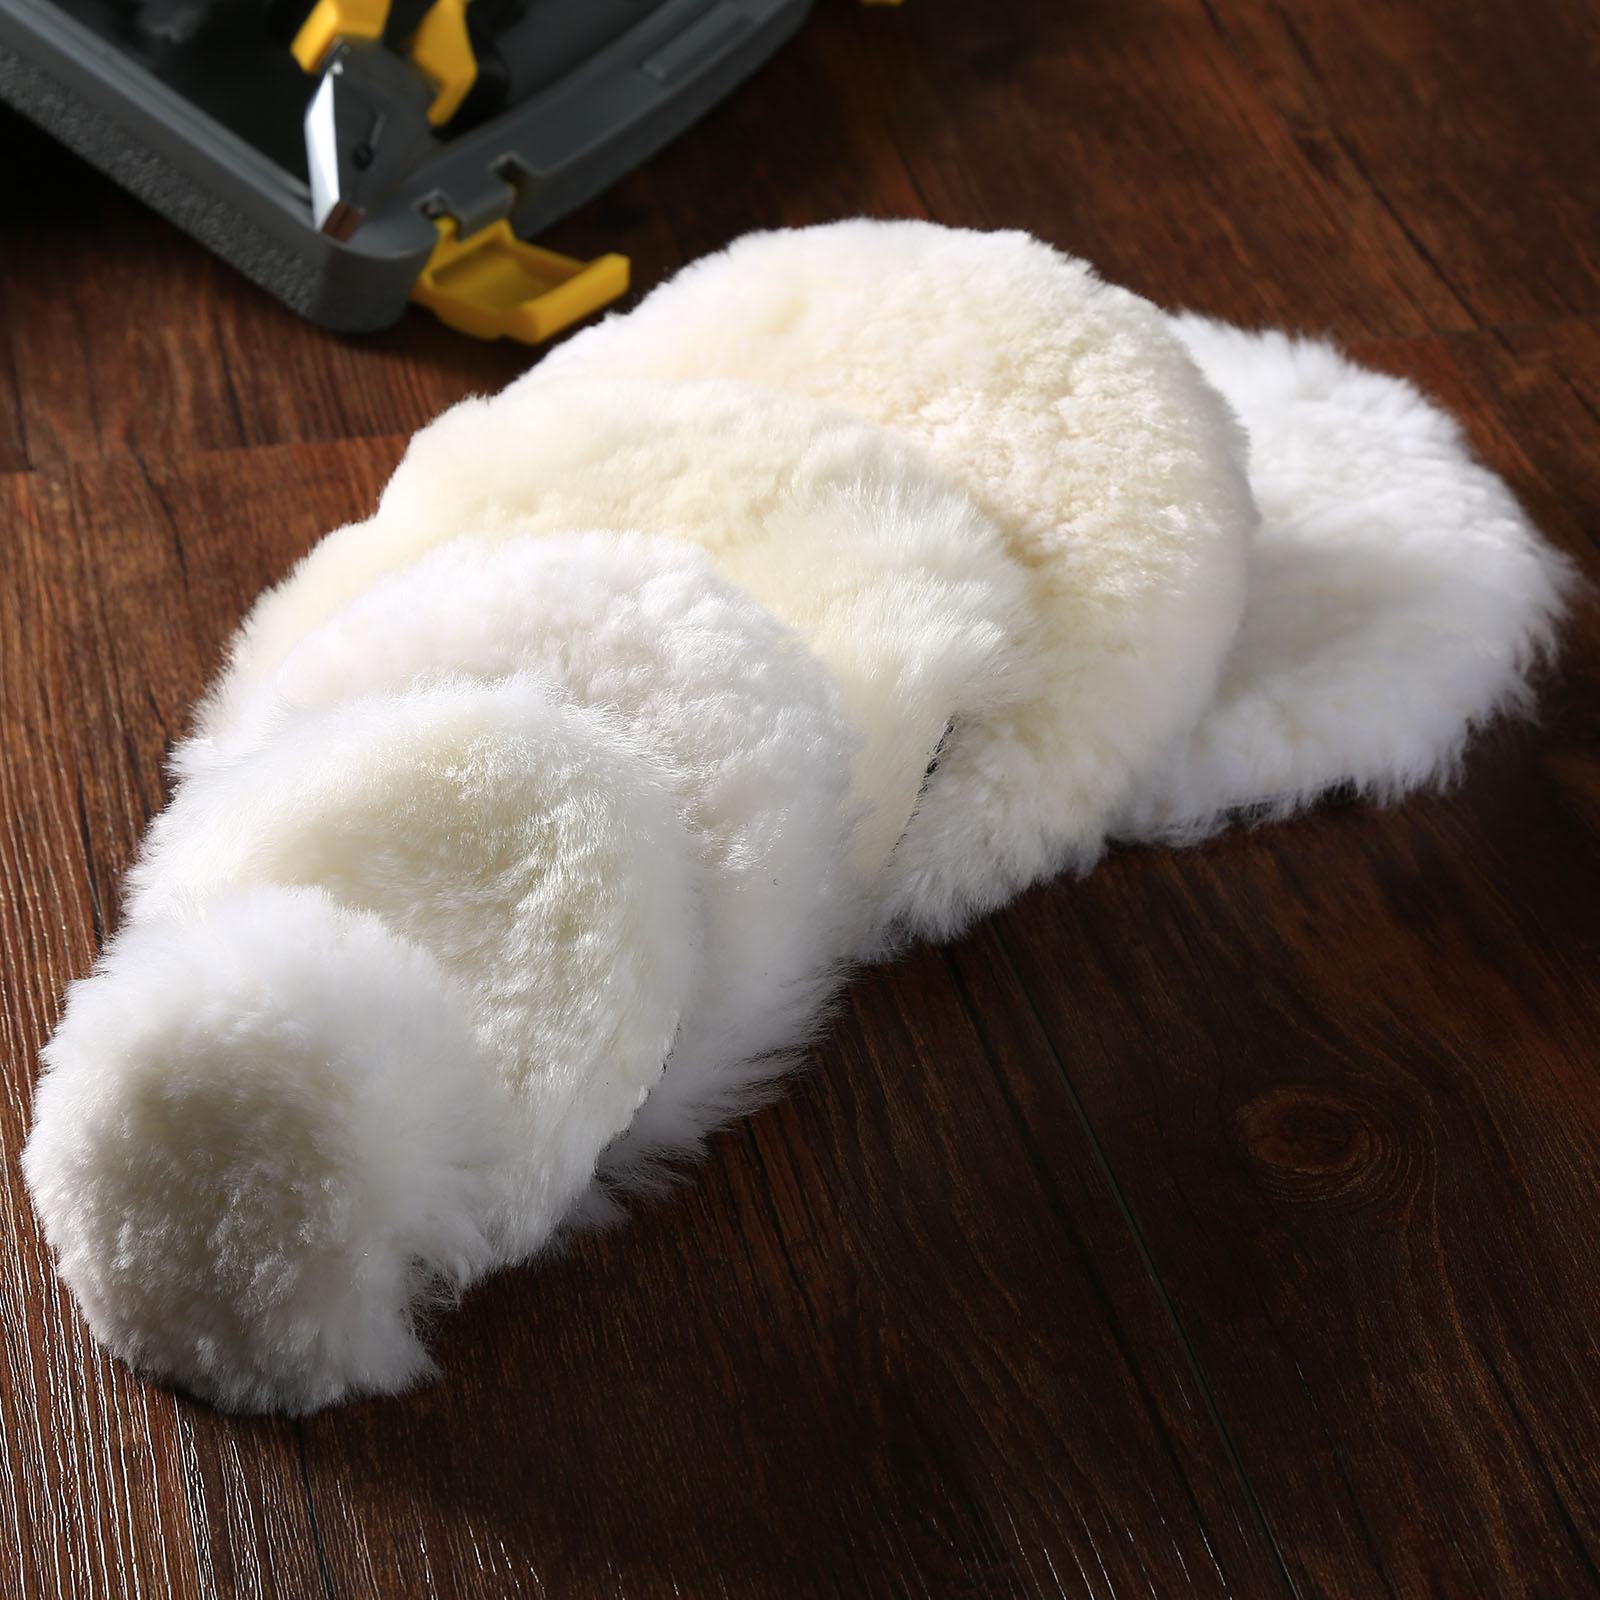 2Pcs 2inch Lambs Wool Pads Waxing Polishing Buffing Pad Wheel Auto Car Paint Care Polisher Pads Auto Polishing Tools Accessories